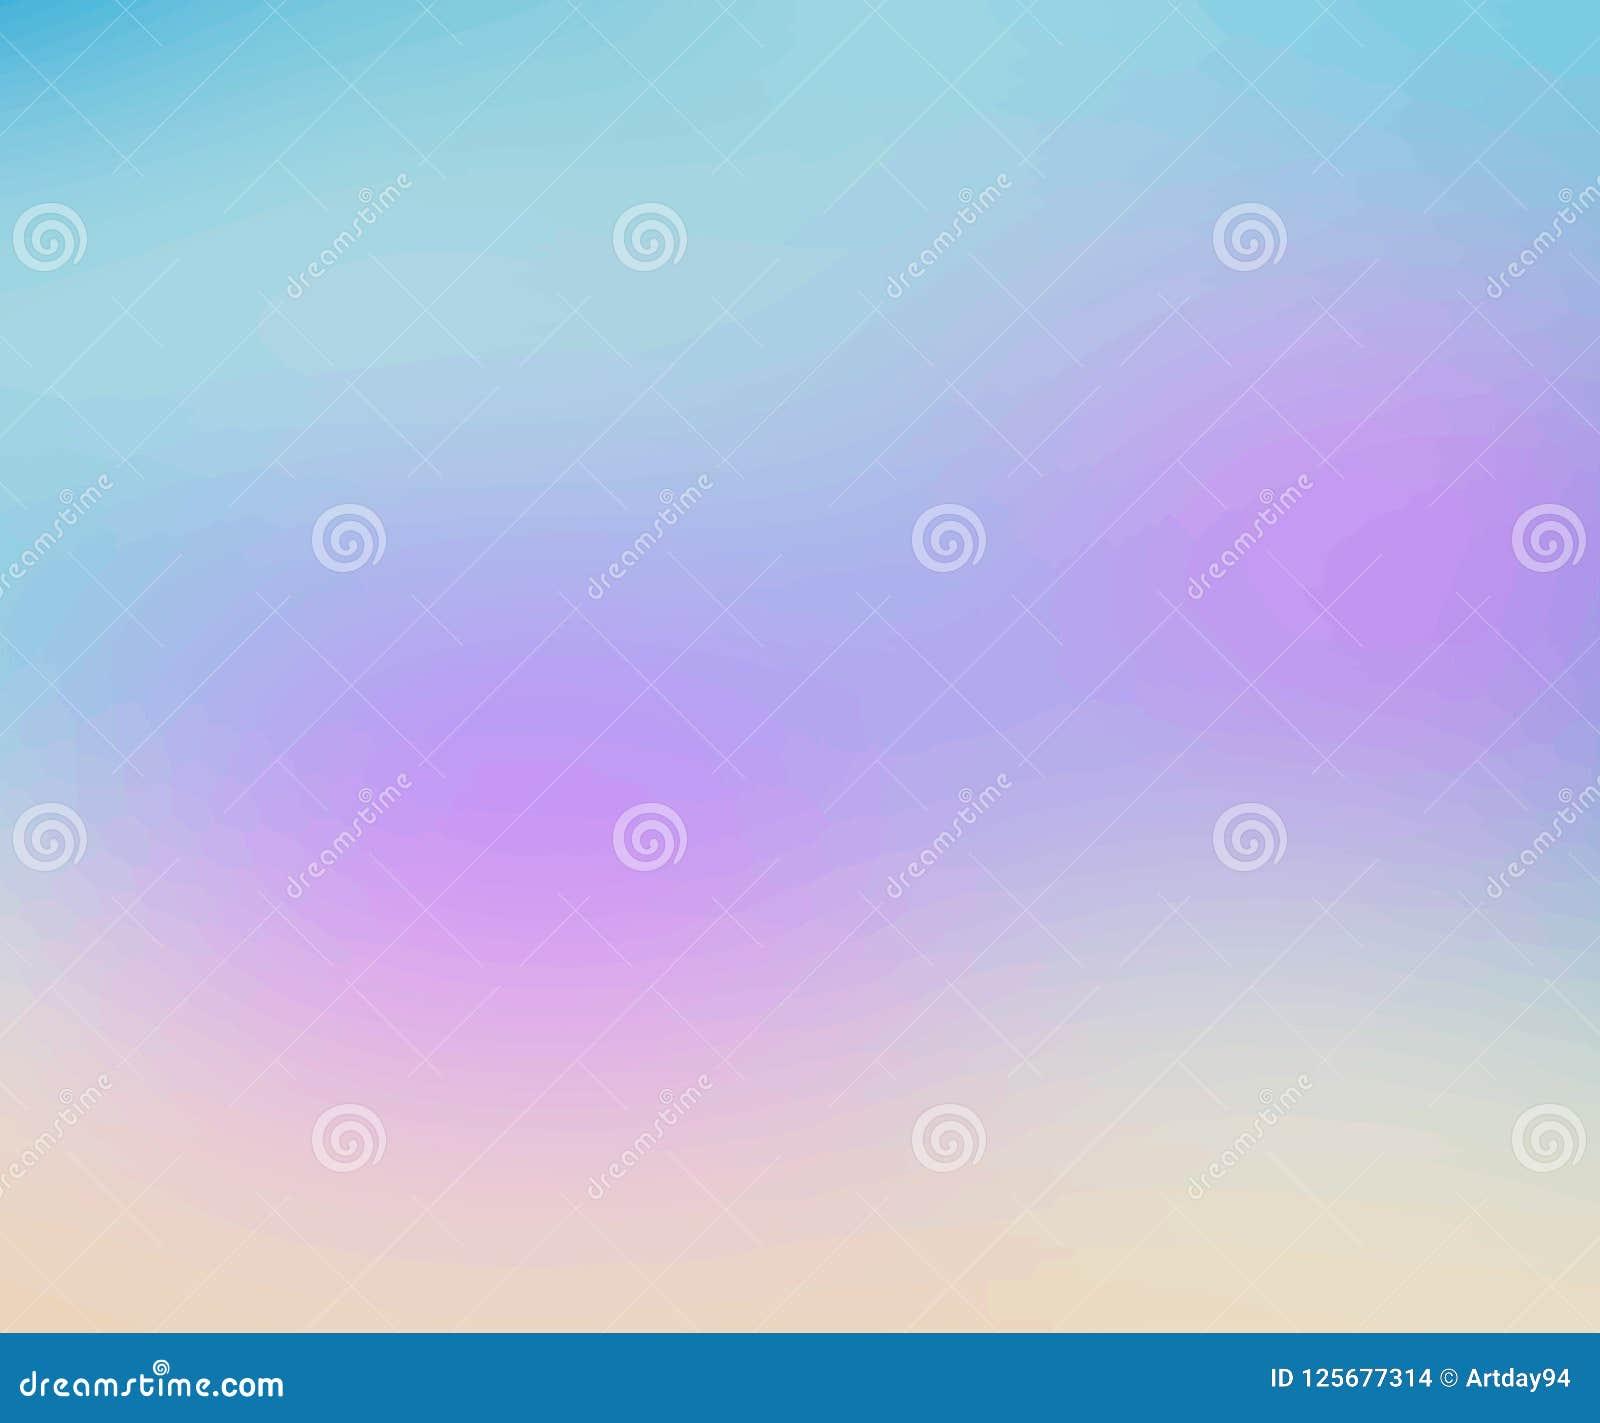 Fundo borrado colorido abstrato vetor criativo do conceito Molde para o cartaz, o inseto e a apresentação, a bandeira, a Web e o